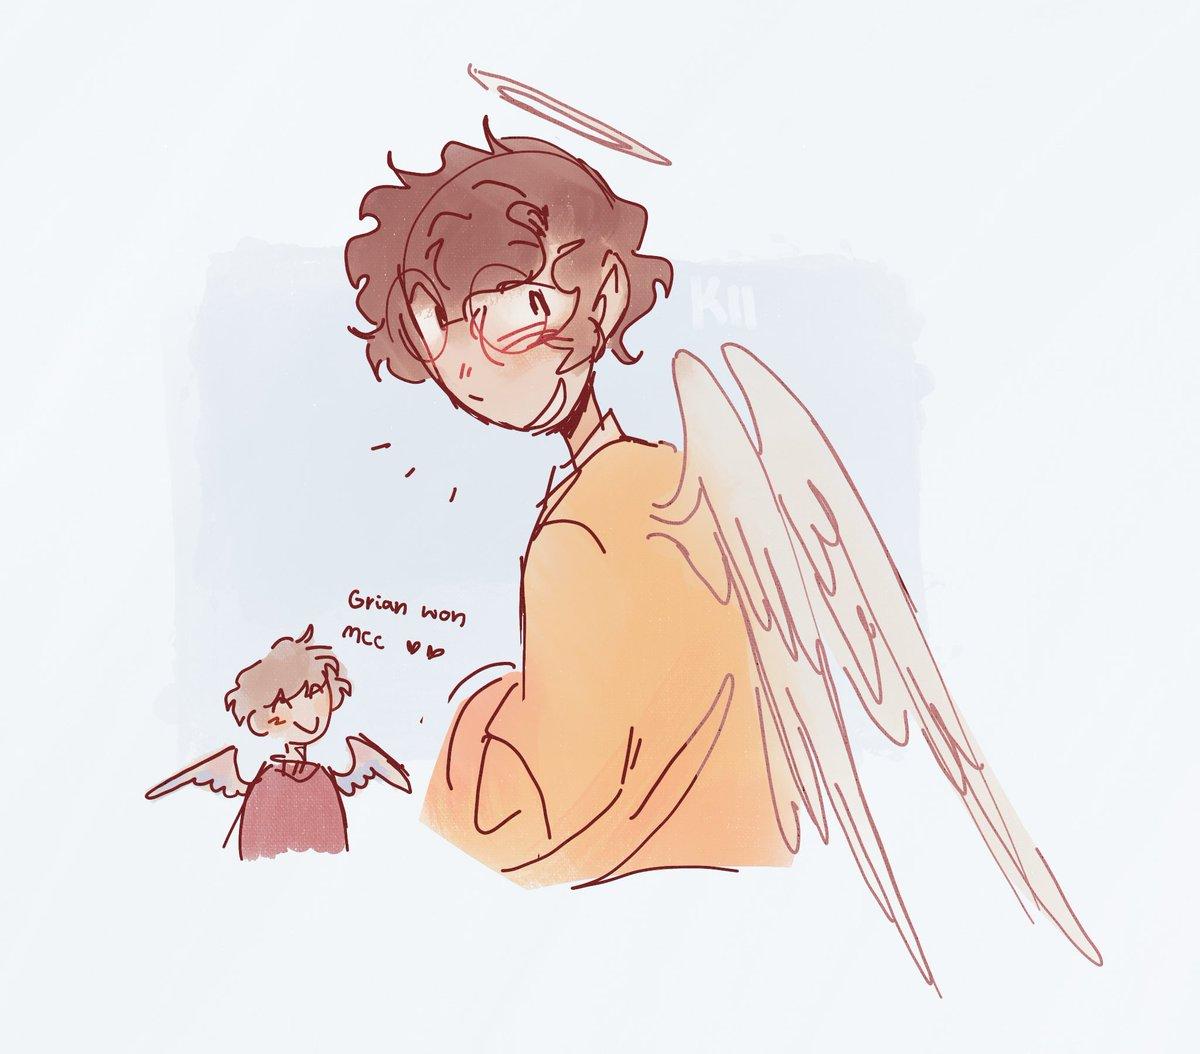 angelbur and small grain ❤️❤️❤️ -Kii